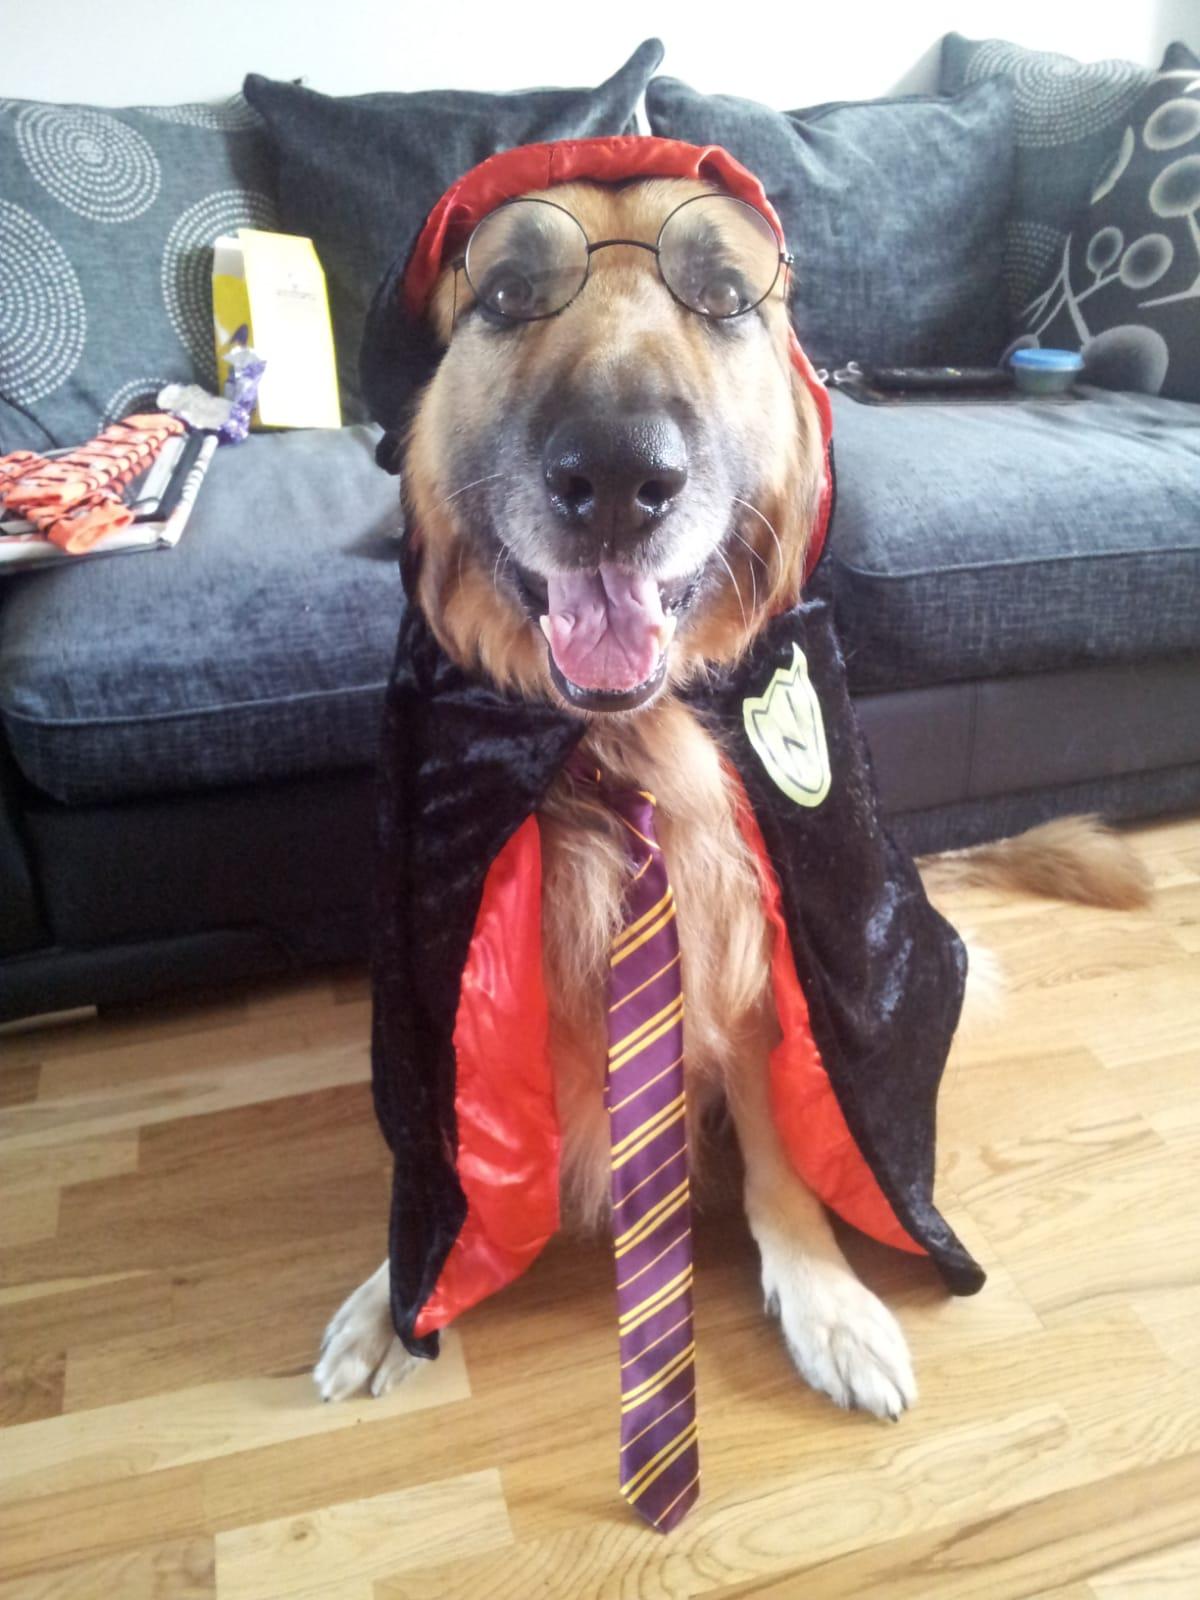 German Shepherd in dress up clothes